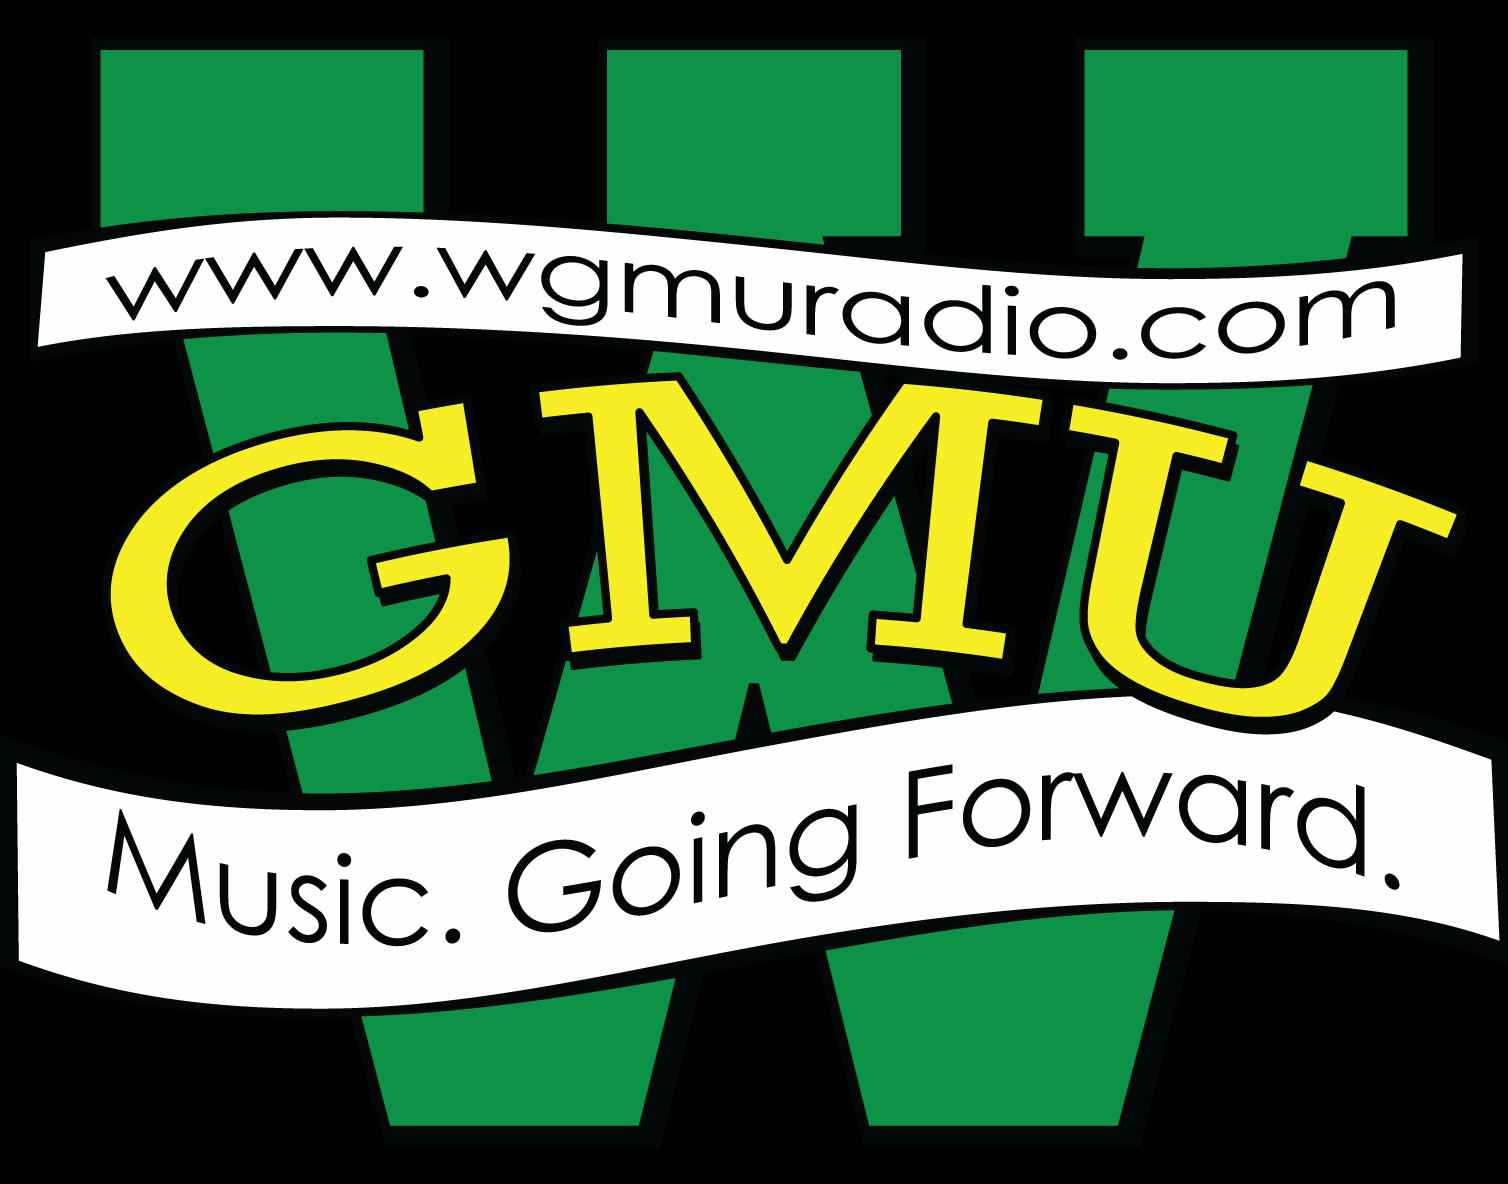 wgmu logo